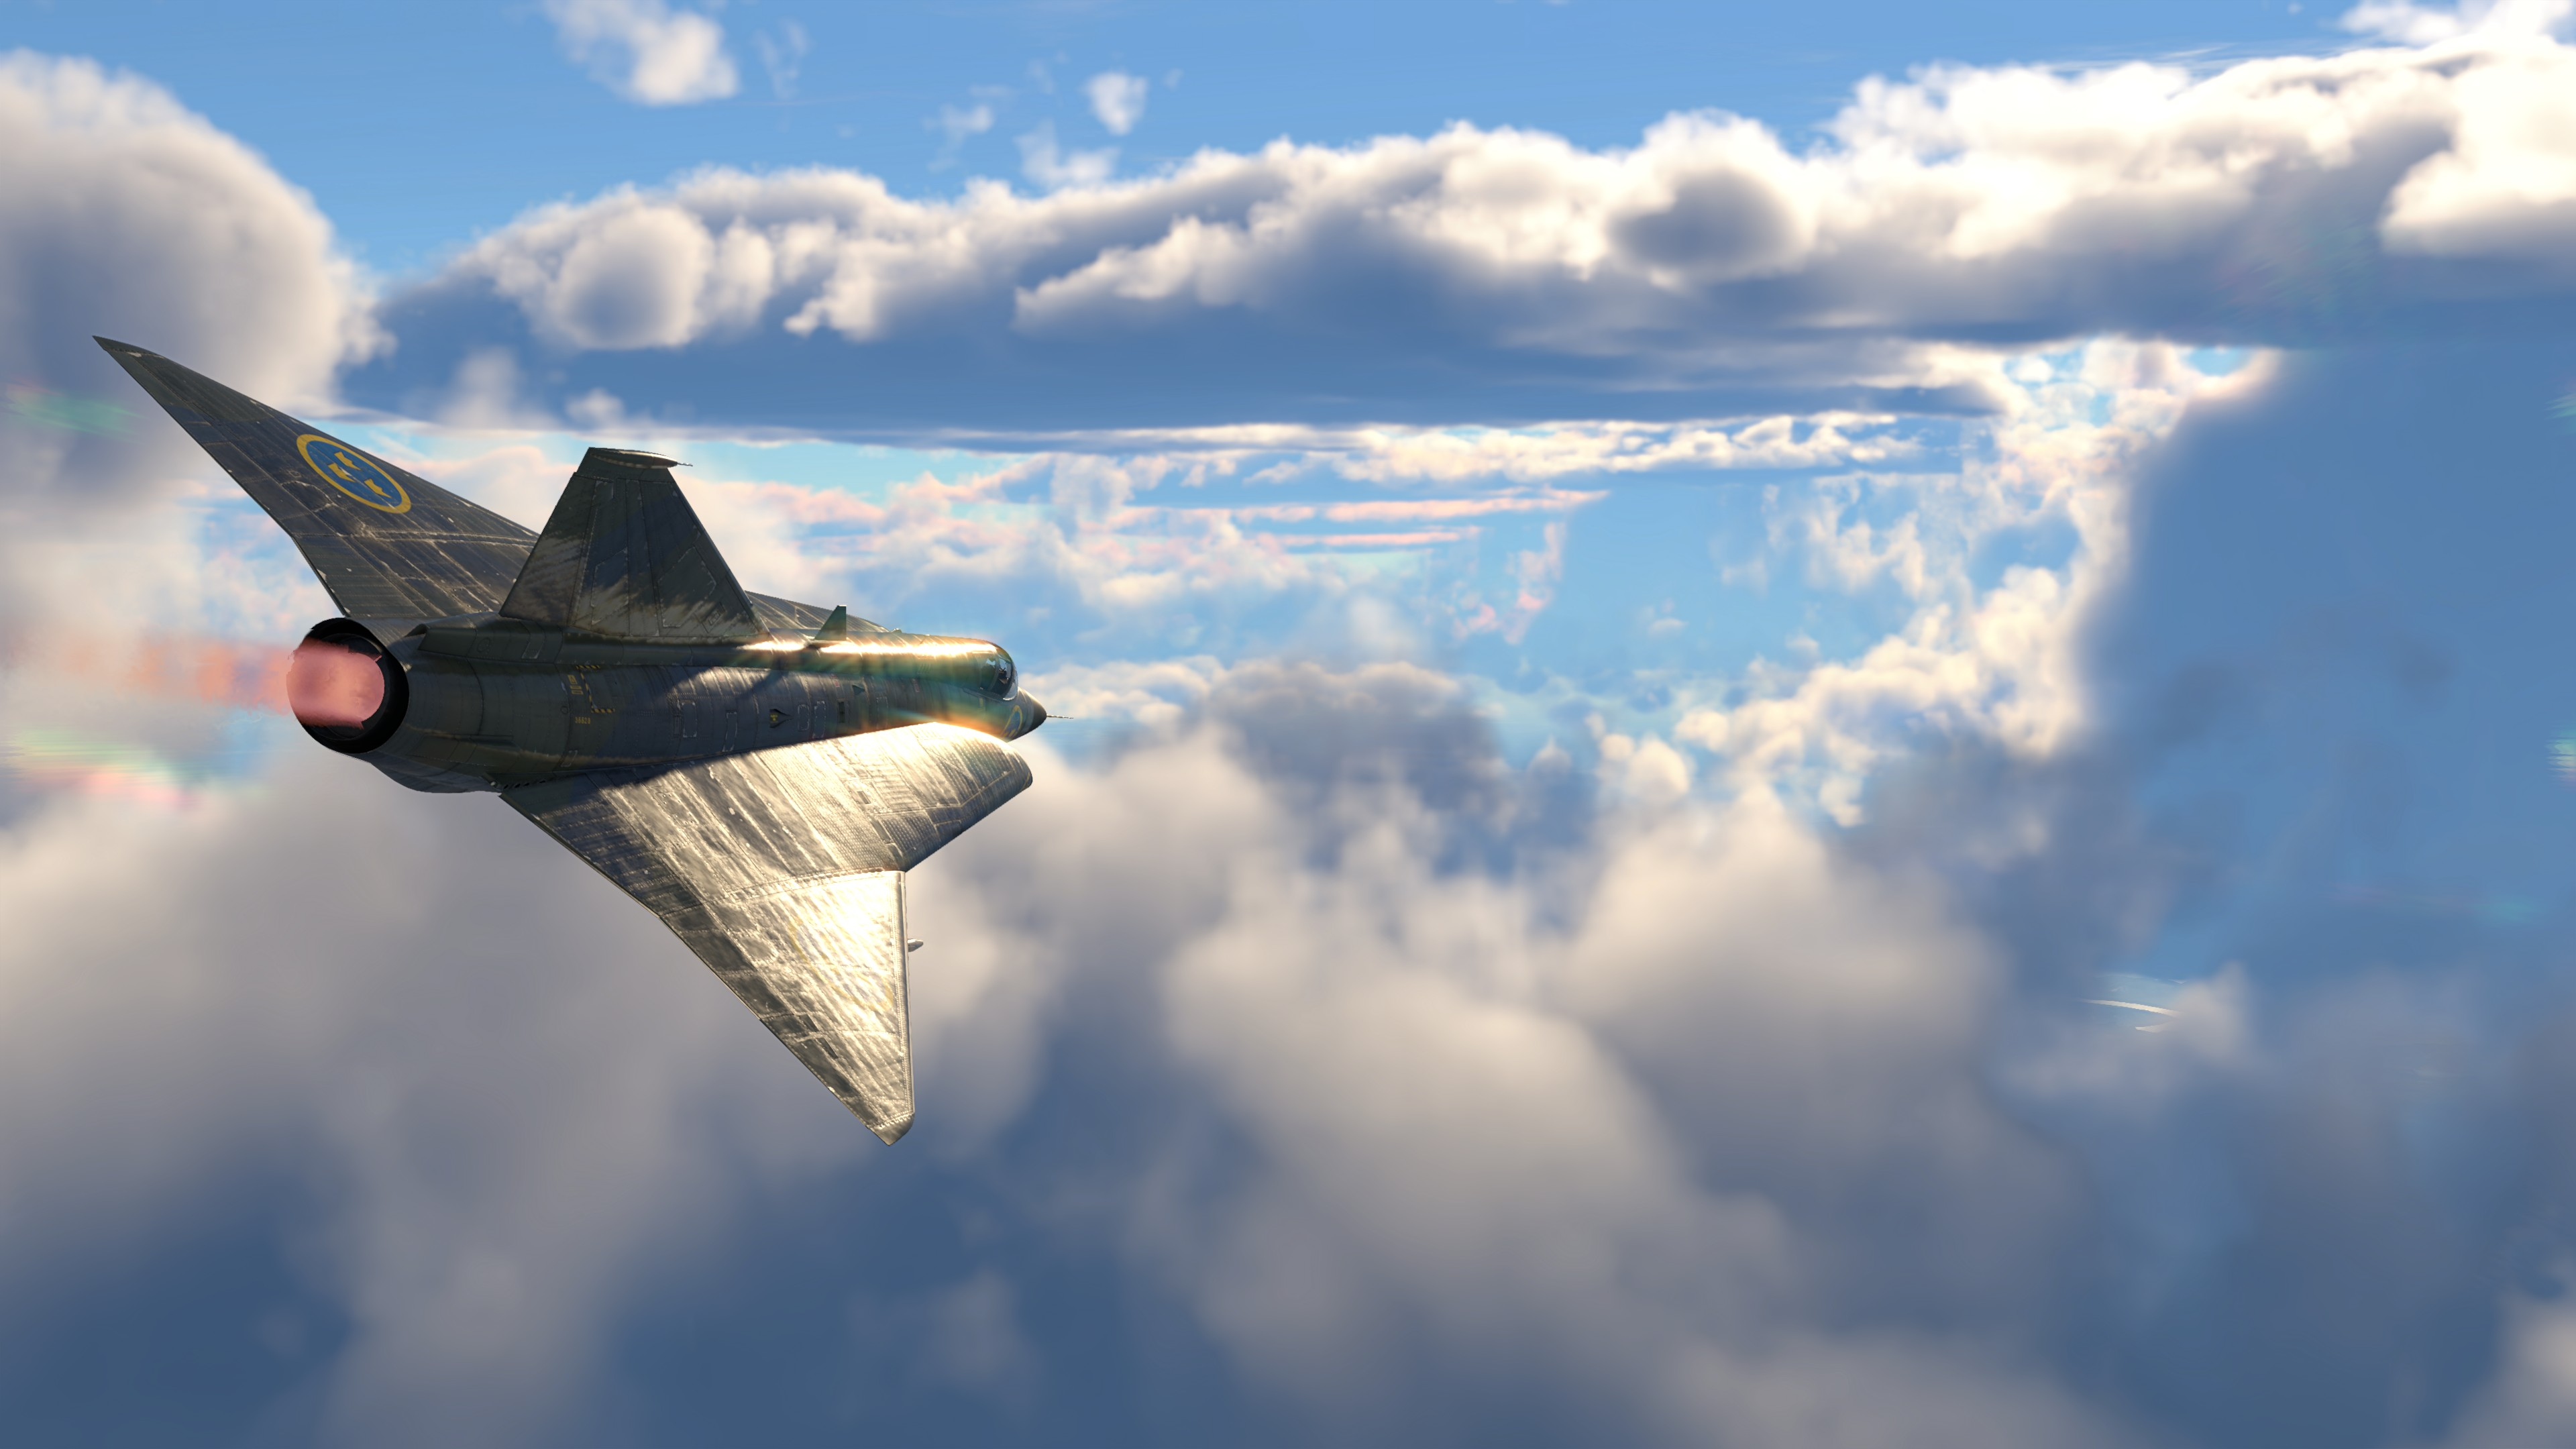 Полёт самолёта между слоями облаков